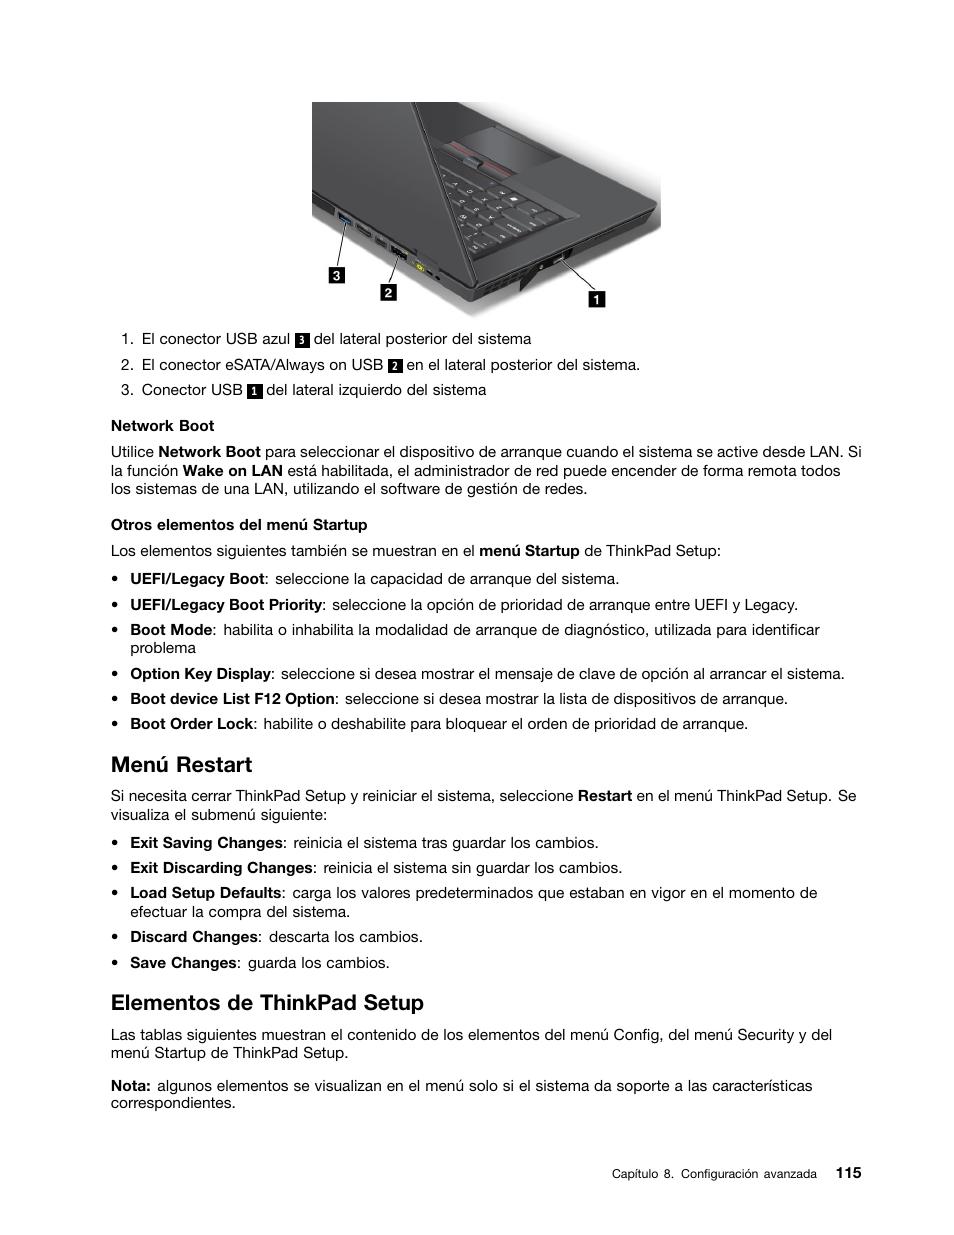 Menú restart, Elementos de thinkpad setup | Lenovo IdeaPad U300e ...